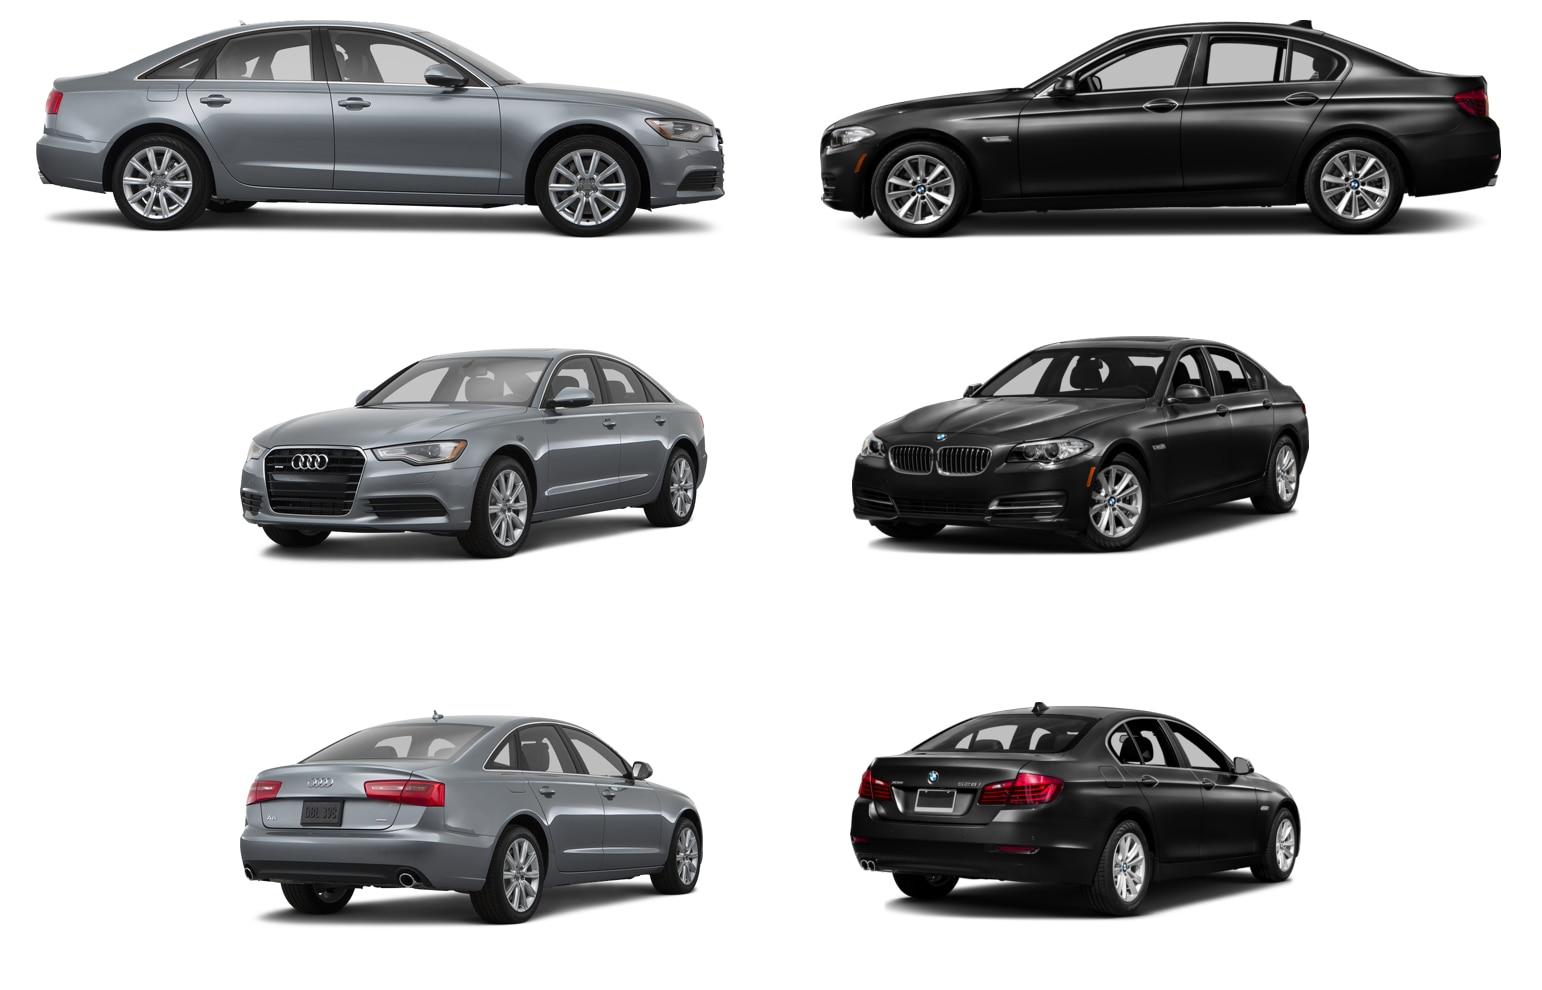 Audi A6 vs BMW 5 Series Huntsville  Compare Full Size Luxury Cars